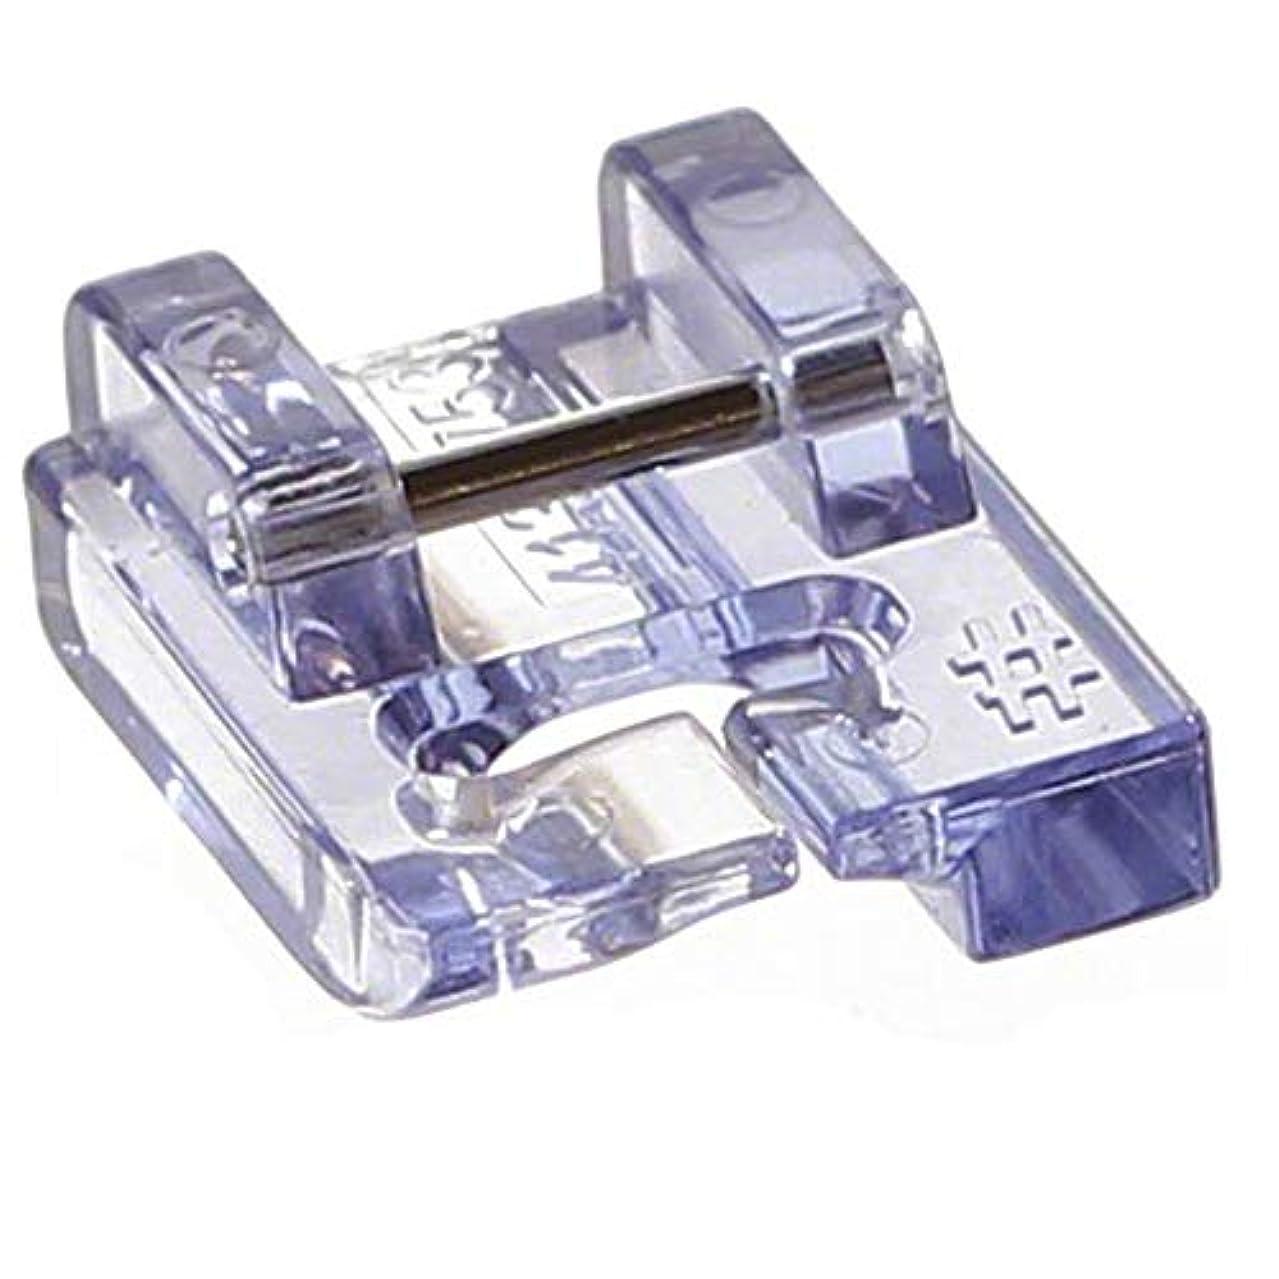 DREAMSTITCH 820790096 Snap On Knit Edge Presser Foot for Pfaff Sewing Machine Group B,C,D,E,F,G,J #820790096